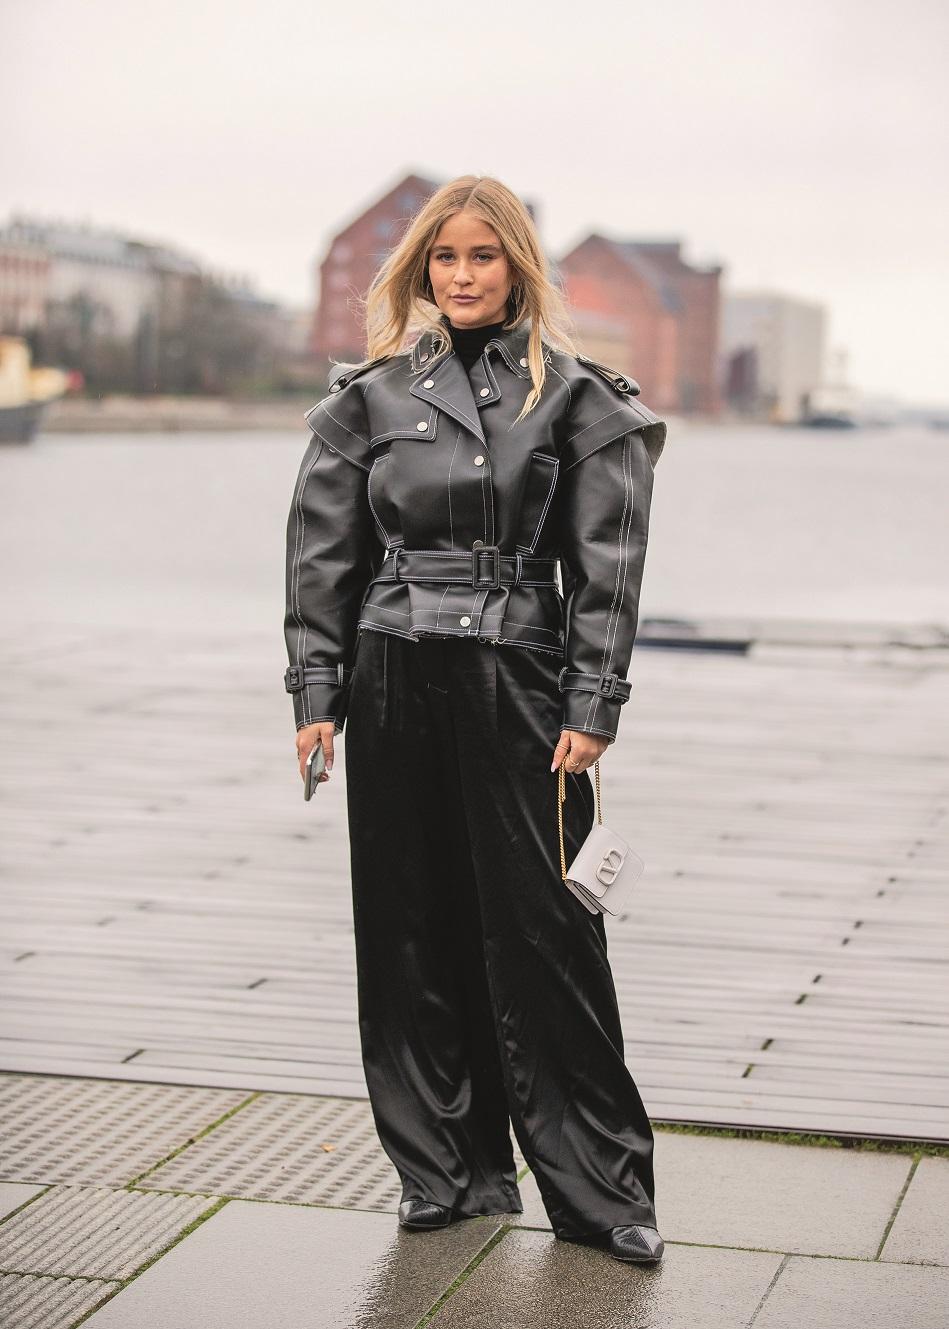 COPENHAGEN, DENMARK - JANUARY 28: Josefine Haaning Jensen seen wearing black leather jacket, wide leg pants, micro bag outside 7 Days on Day 1 during Copenhagen Fashion Week Autumn/Winter 2020 on January 28, 2020 in Copenhagen, Denmark. (Photo by Christian Vierig/Getty Images)